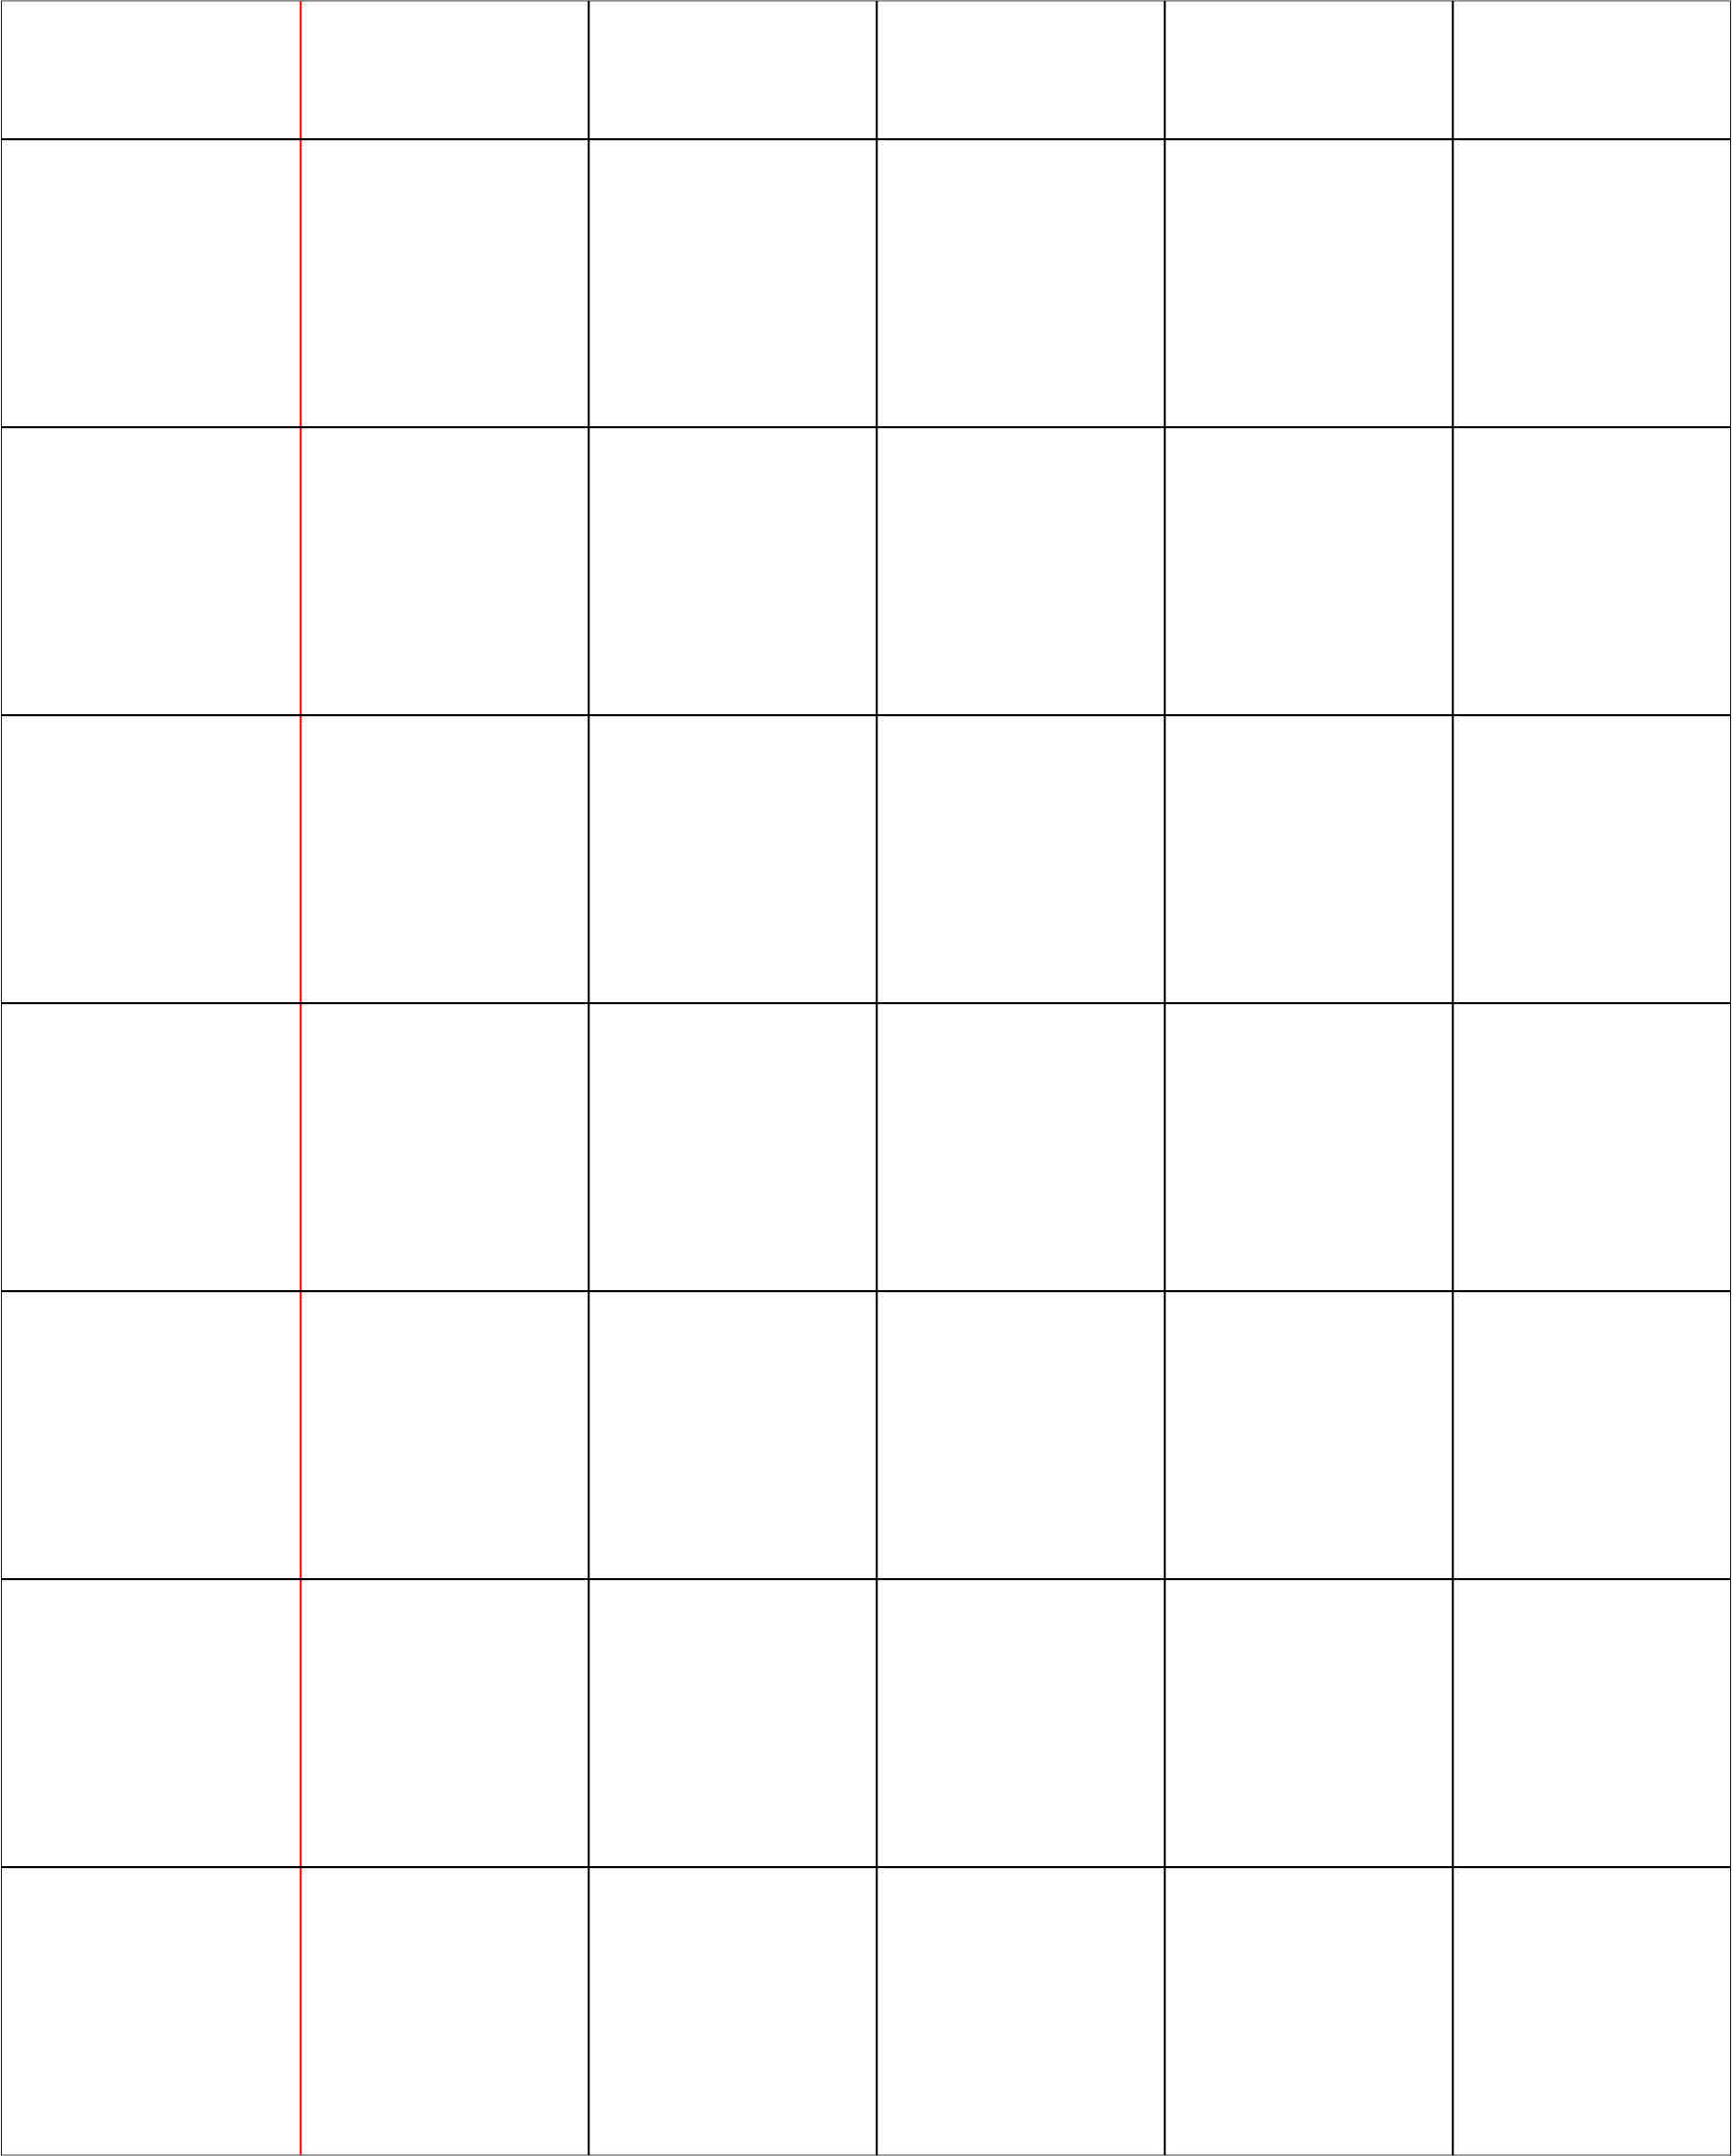 Sundaram Winner Brown Note Book (Big Square) - 172 Pages(E-8J)